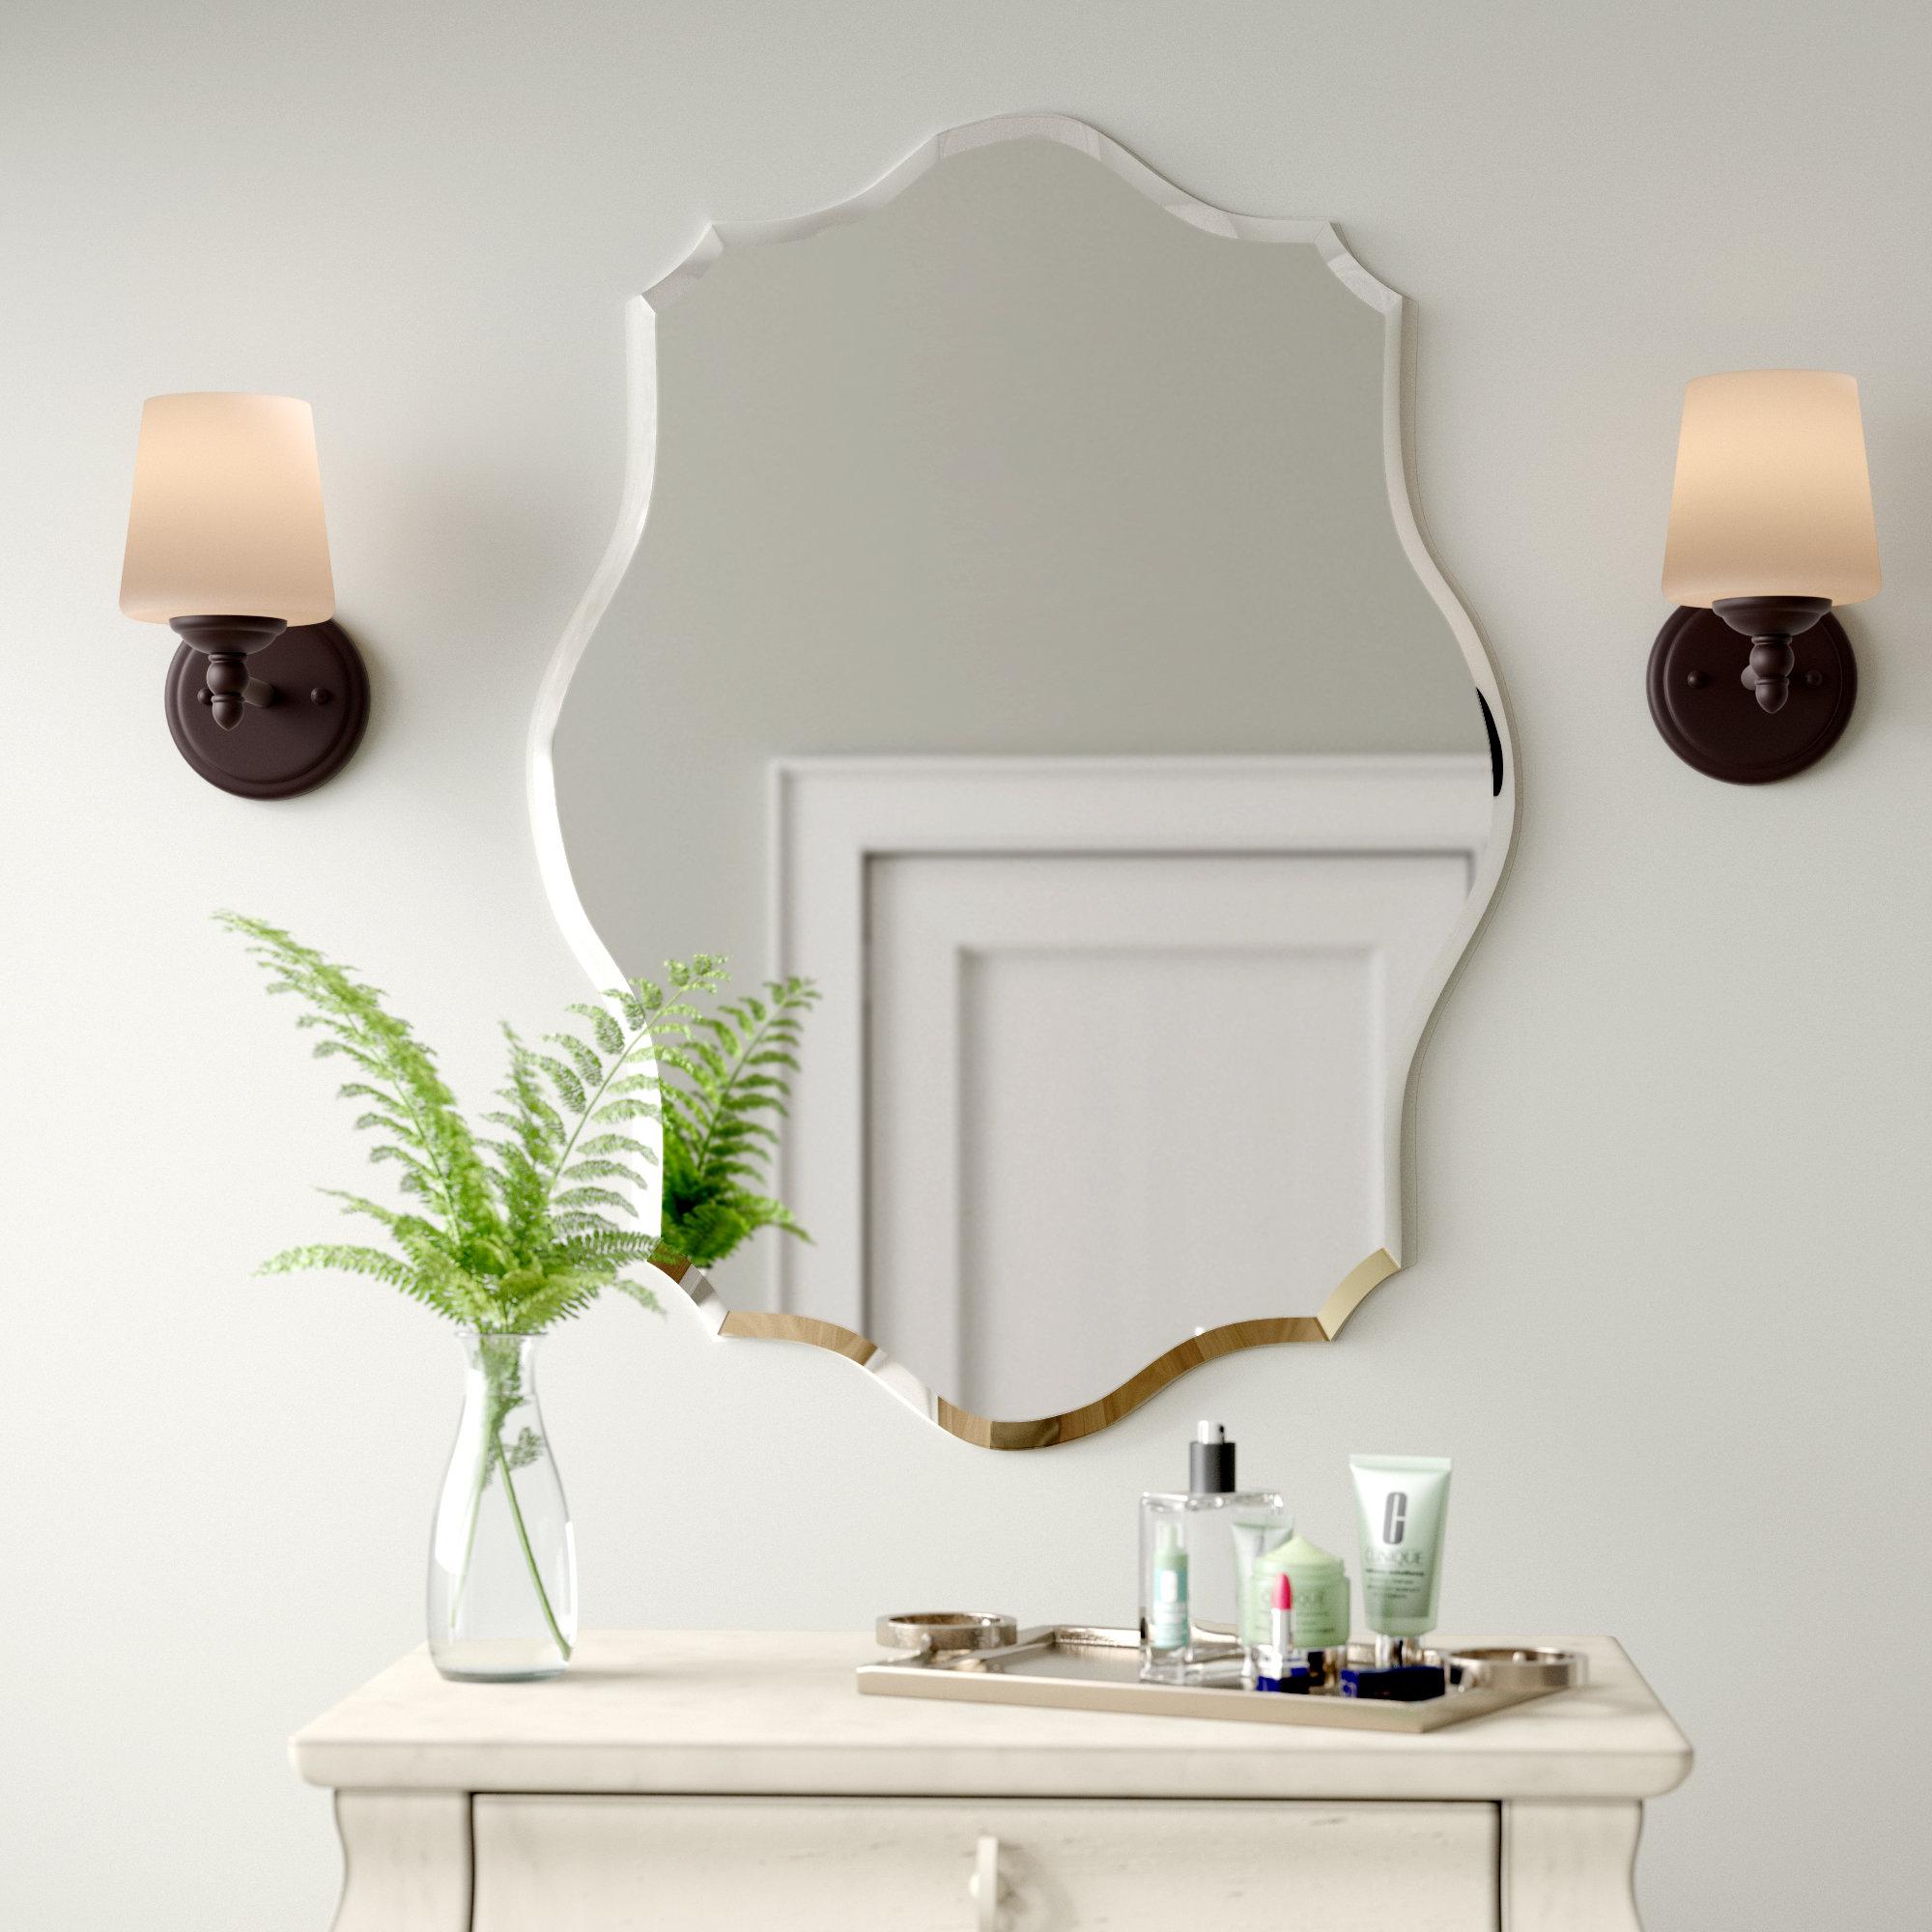 Birch Lane™ Heritage Guidinha Modern & Contemporary Accent Mirror Within Guidinha Modern & Contemporary Accent Mirrors (View 2 of 20)